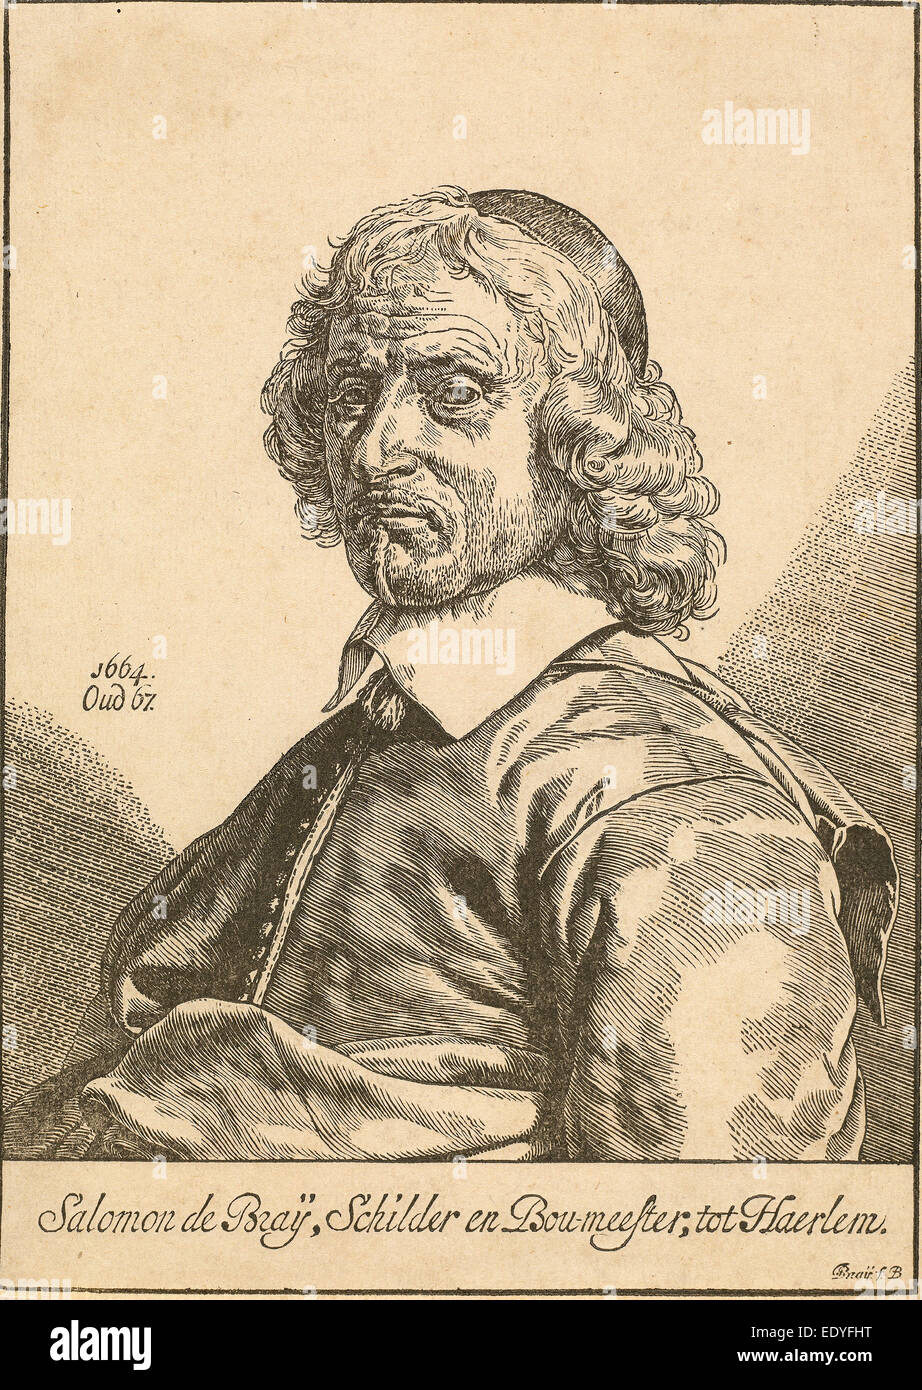 Dirck de Bray (Dutch, active 1651-1678), Solomon de Bray, woodcut - Stock Image